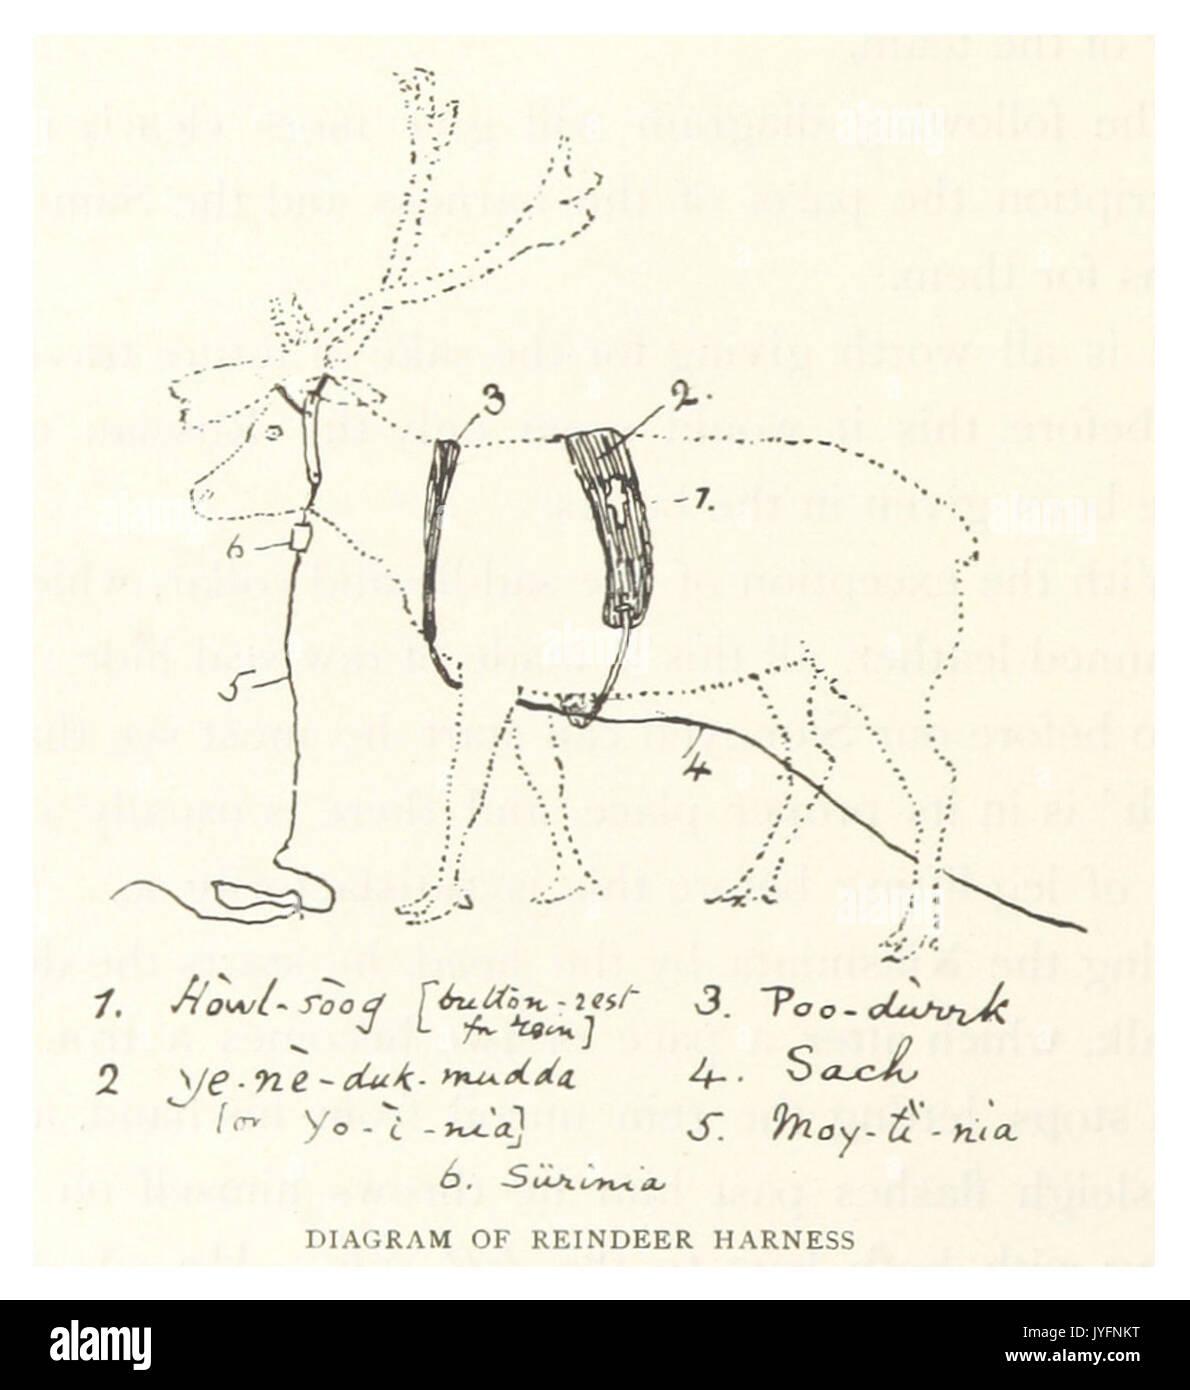 tb1895 p414 reindeer harness JYFNKT tb(1895) p414 reindeer harness stock photo 154624956 alamy